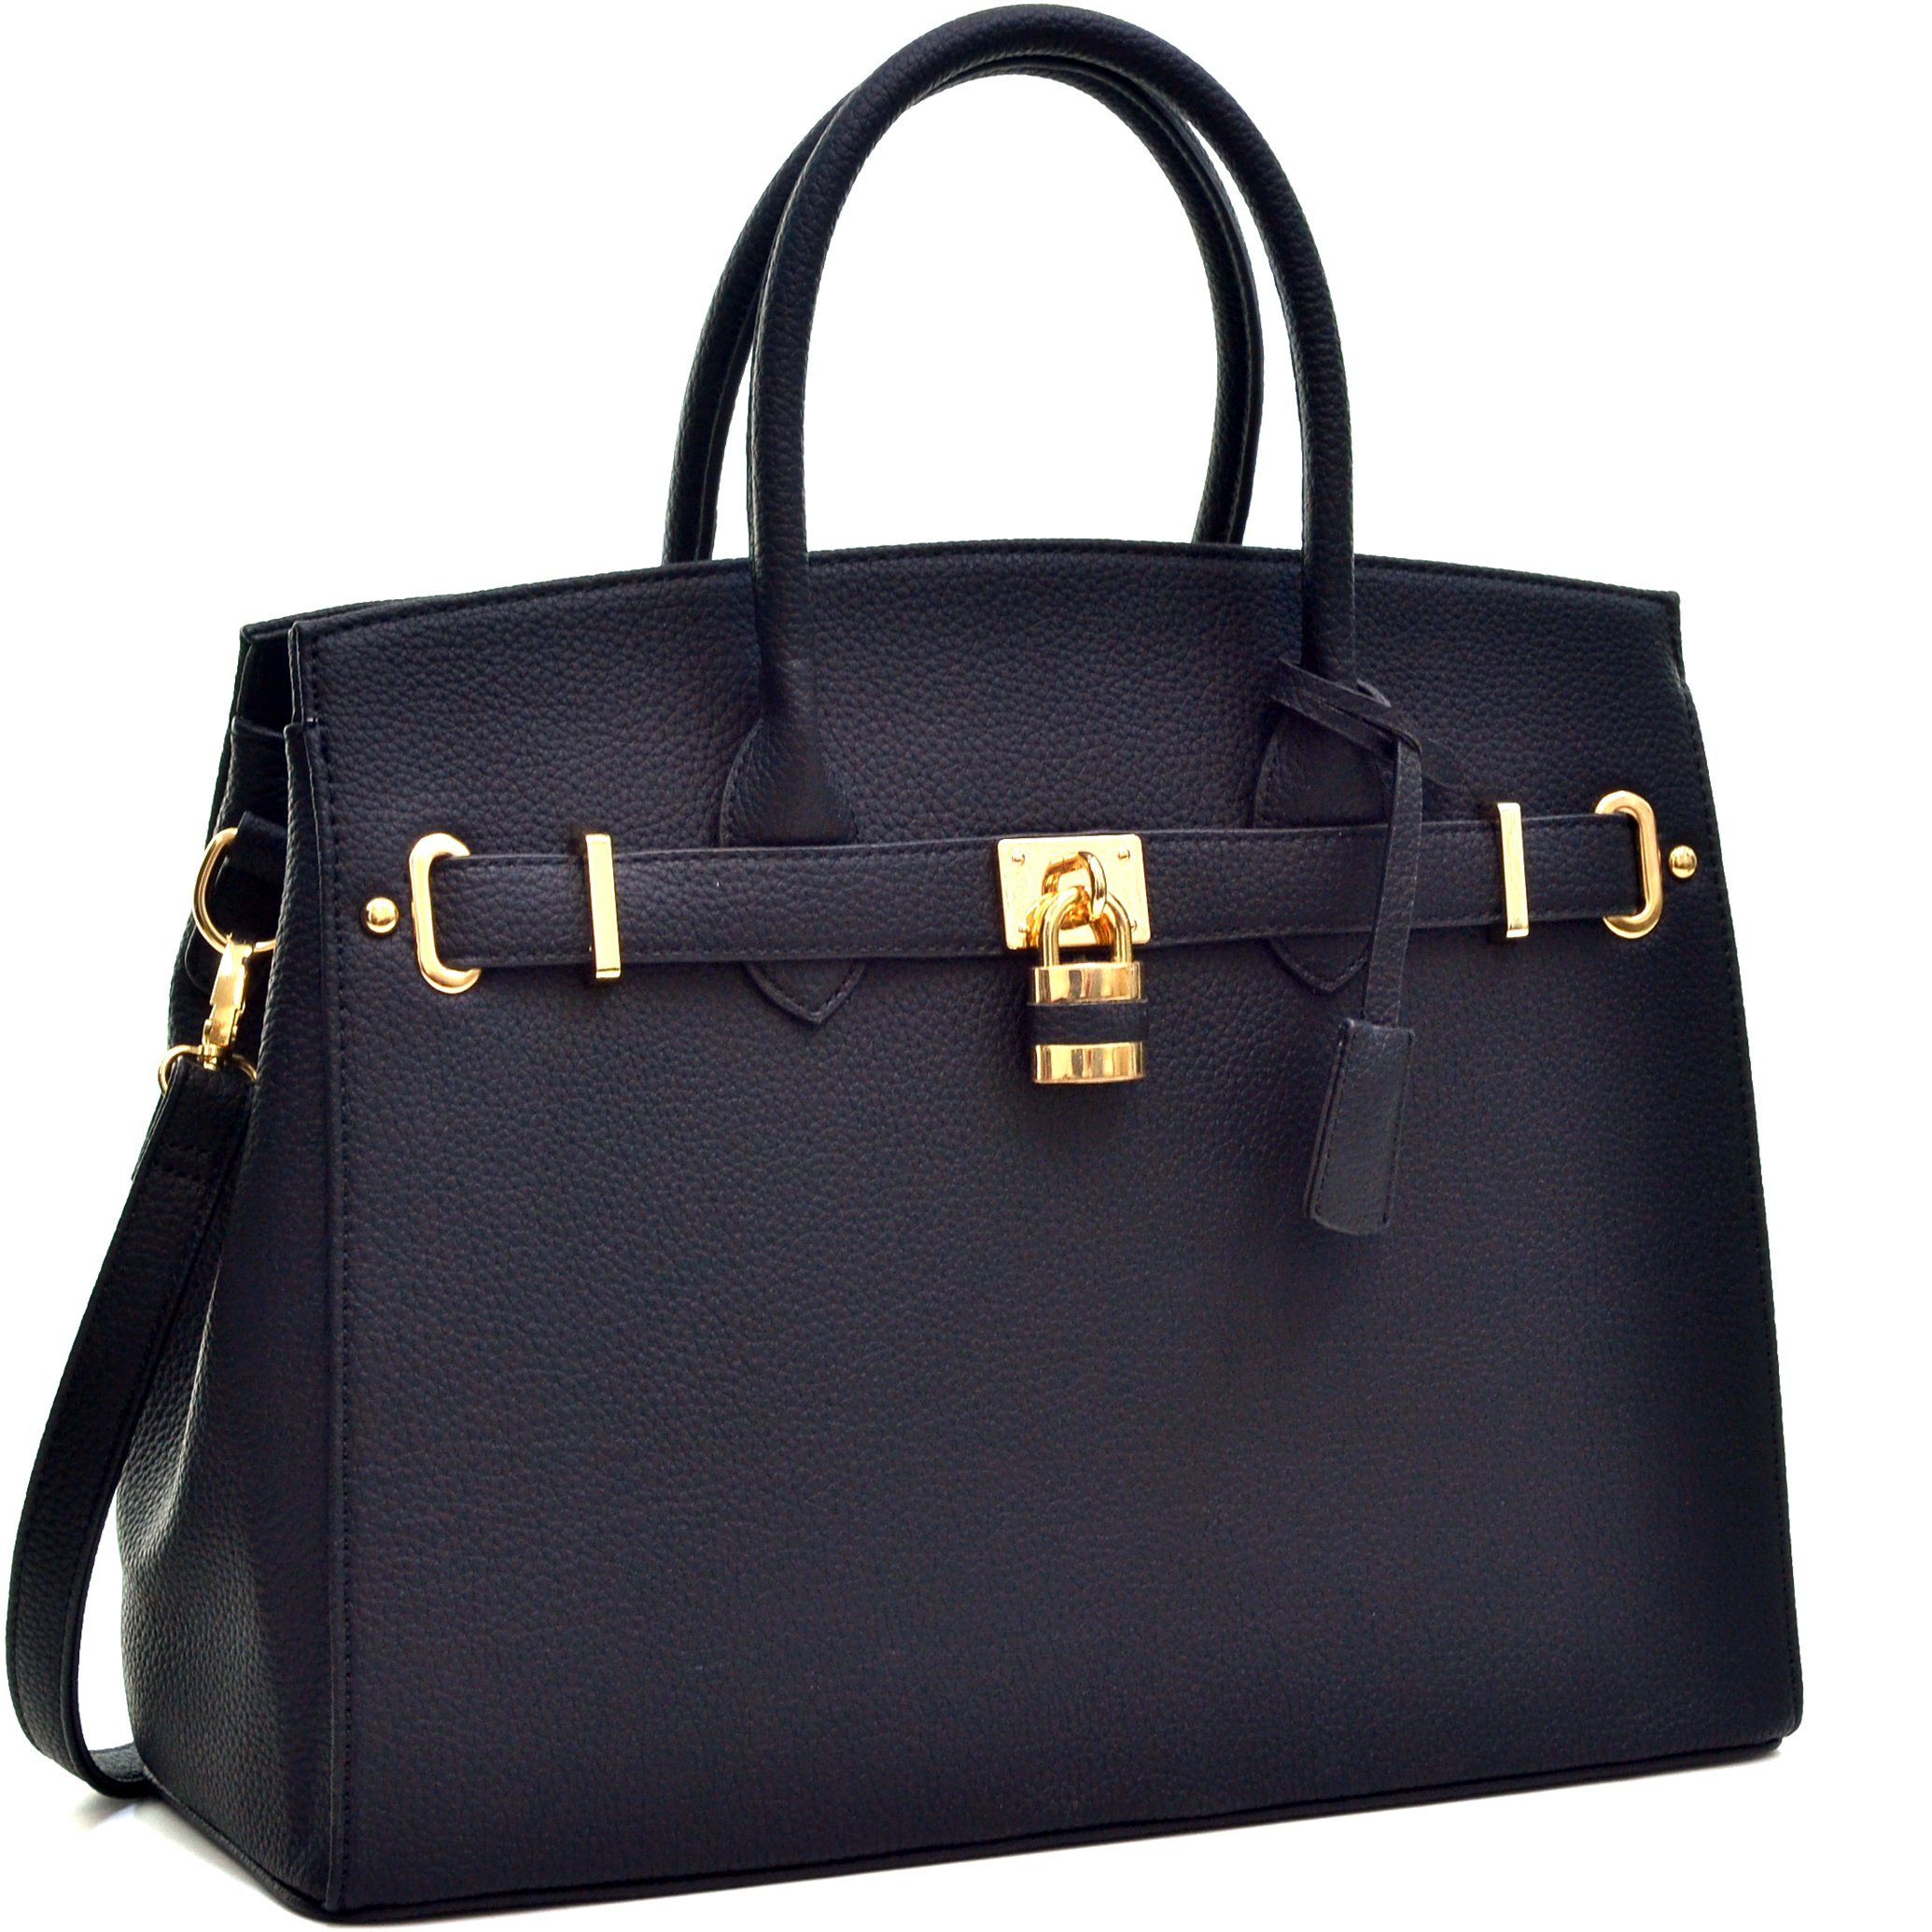 MMK Collection Fashion Women Padlock Handbag ~Signature fashion Designer Women Satchel Purse Black & Brown (black)